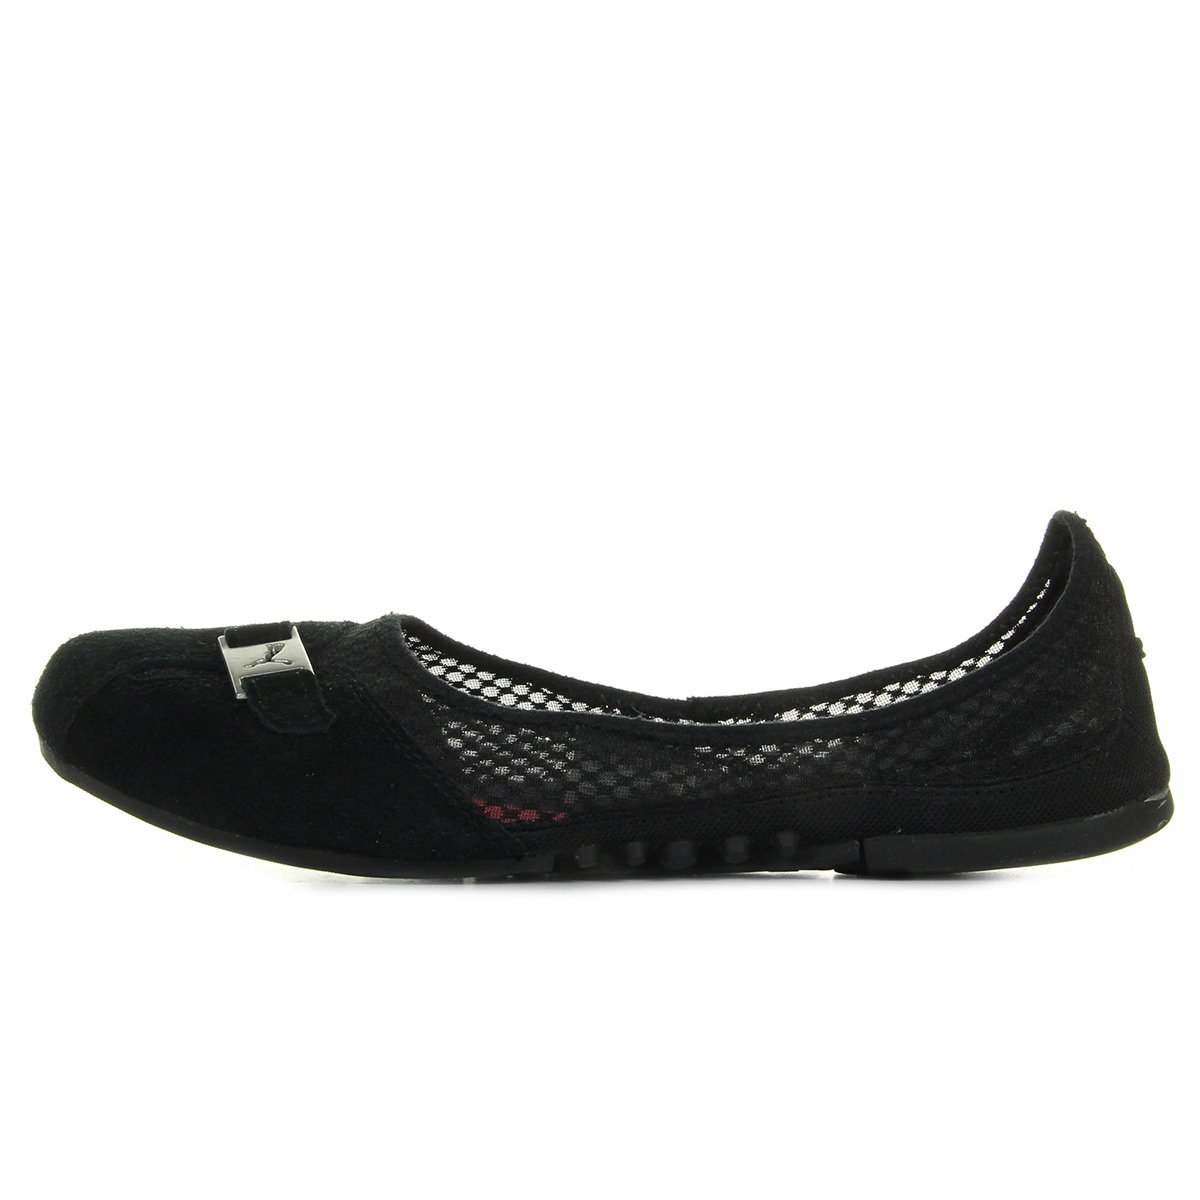 4e1a0b94758ca Puma Women's Sabadella Suede Bl Ballet Flats Black Size: 5: Amazon ...